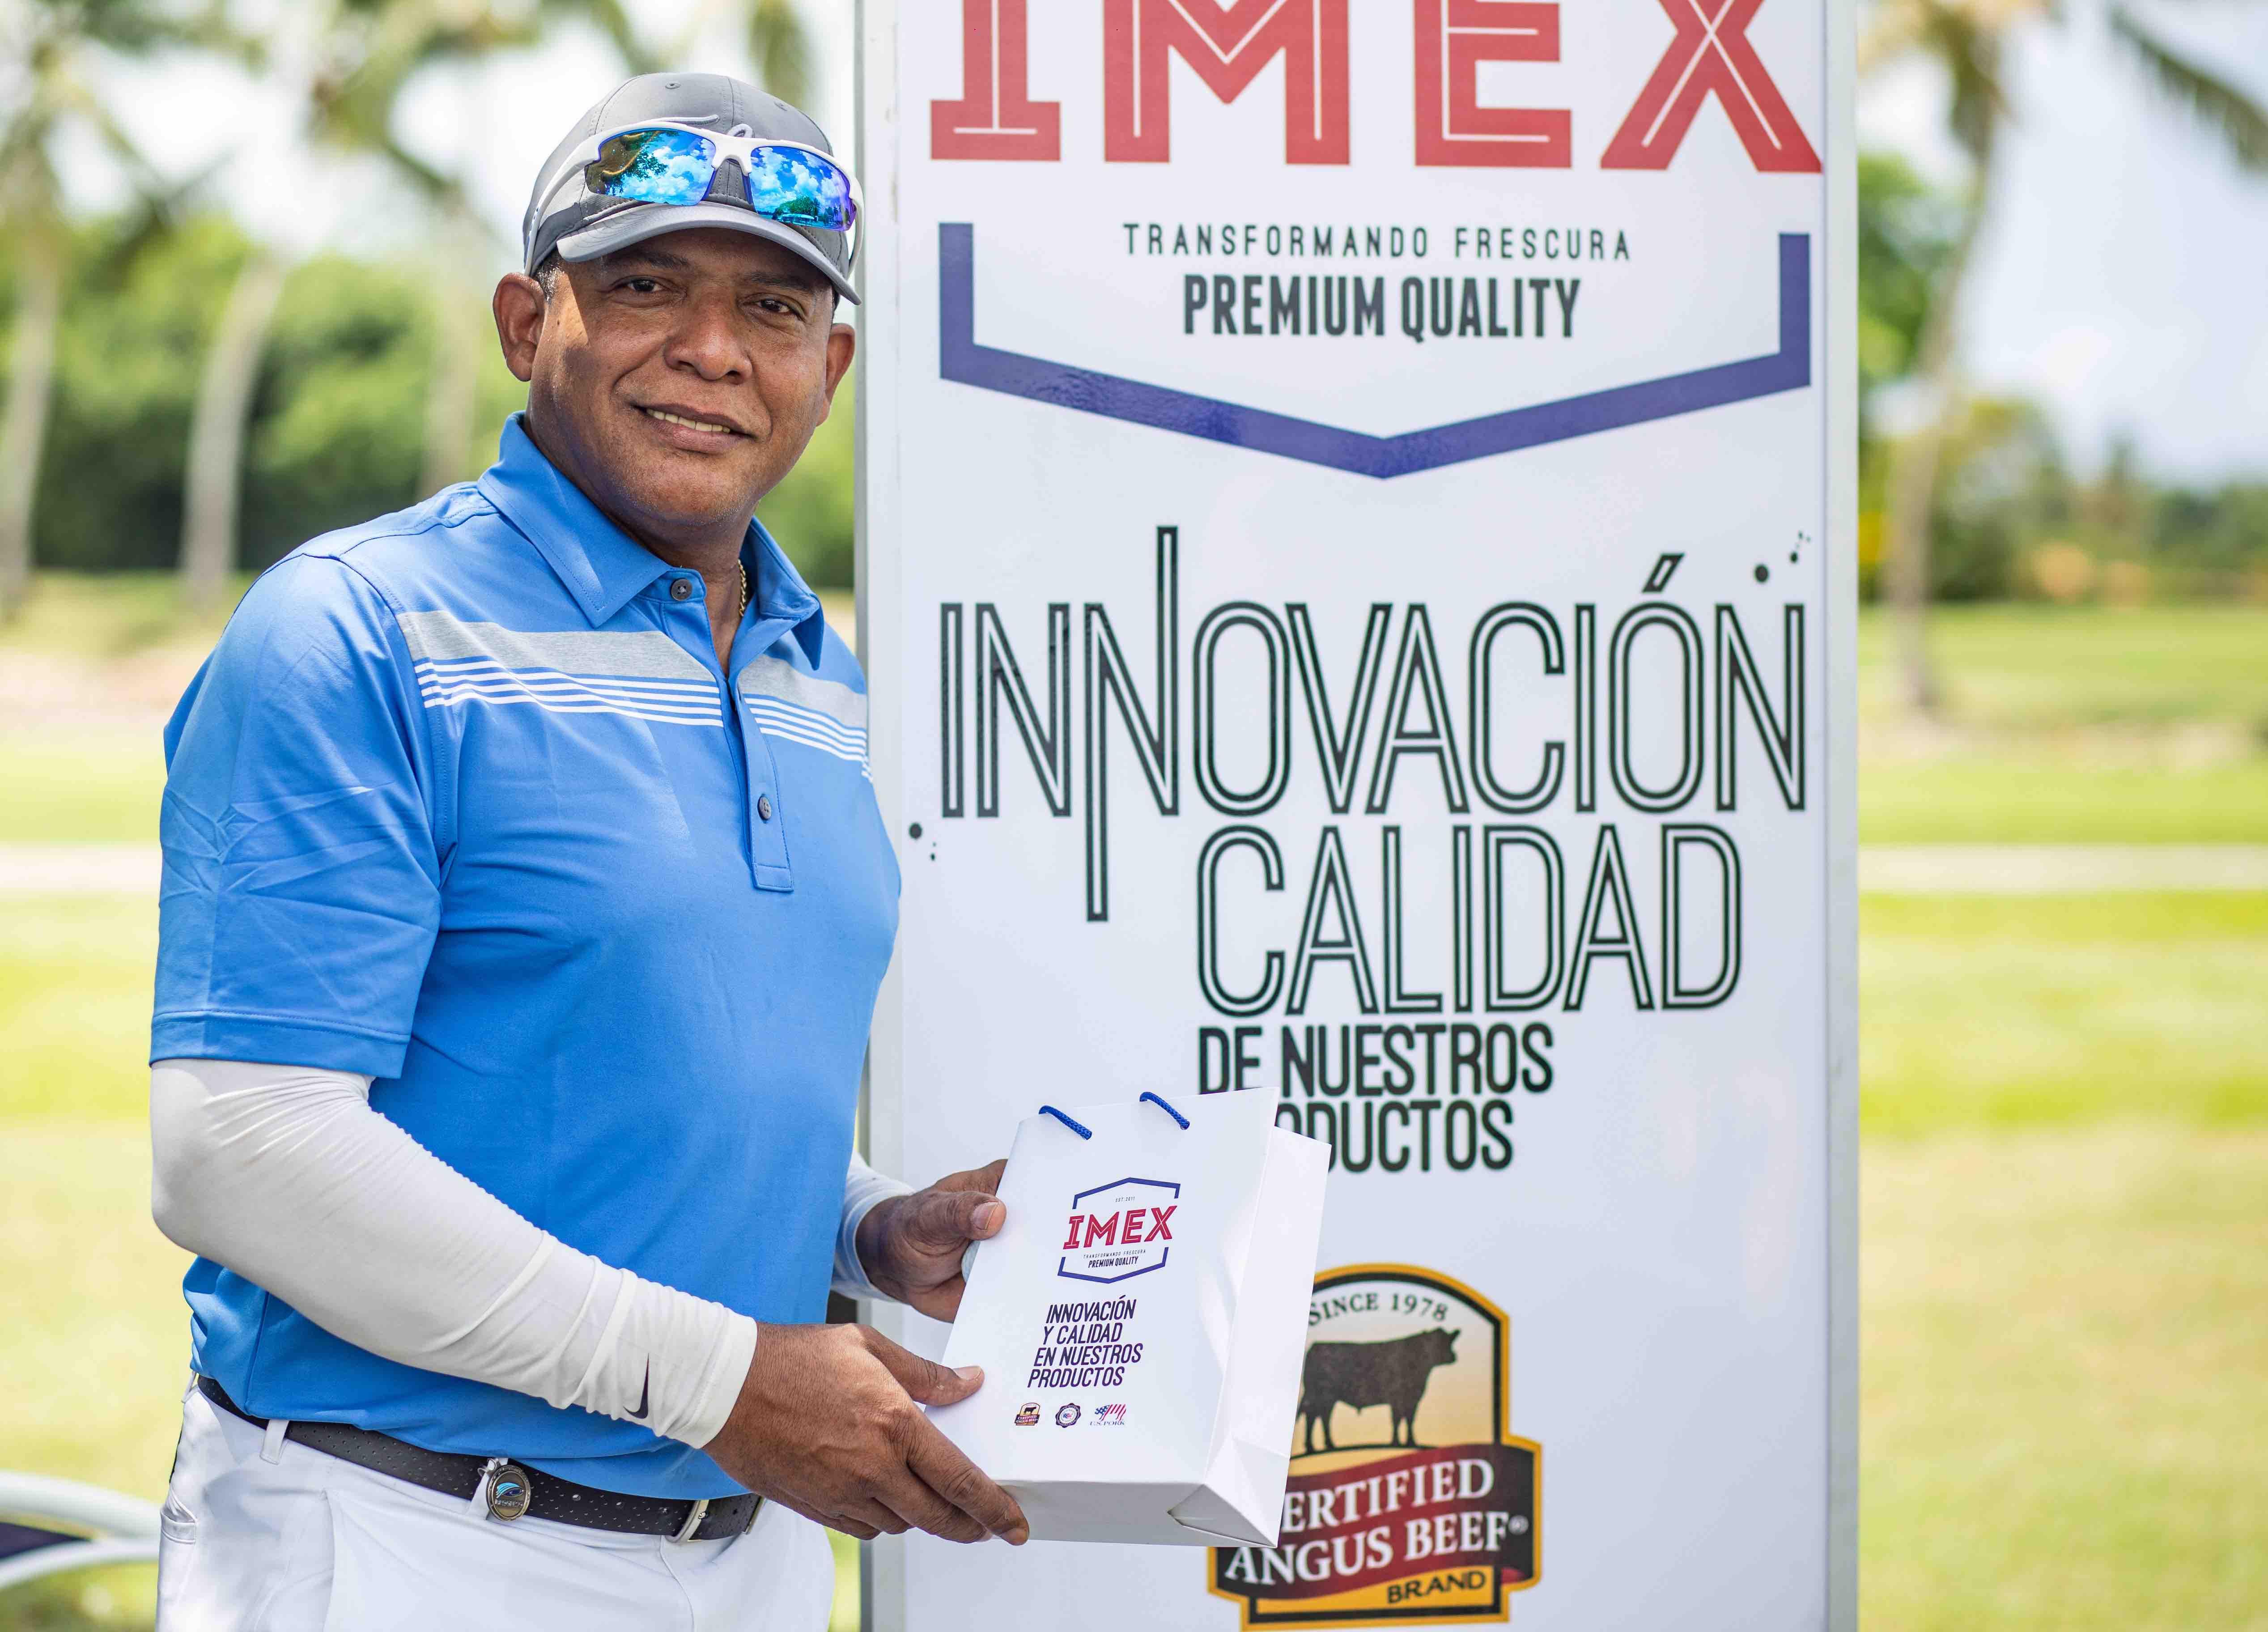 Golfista posa junto al banner de Imex